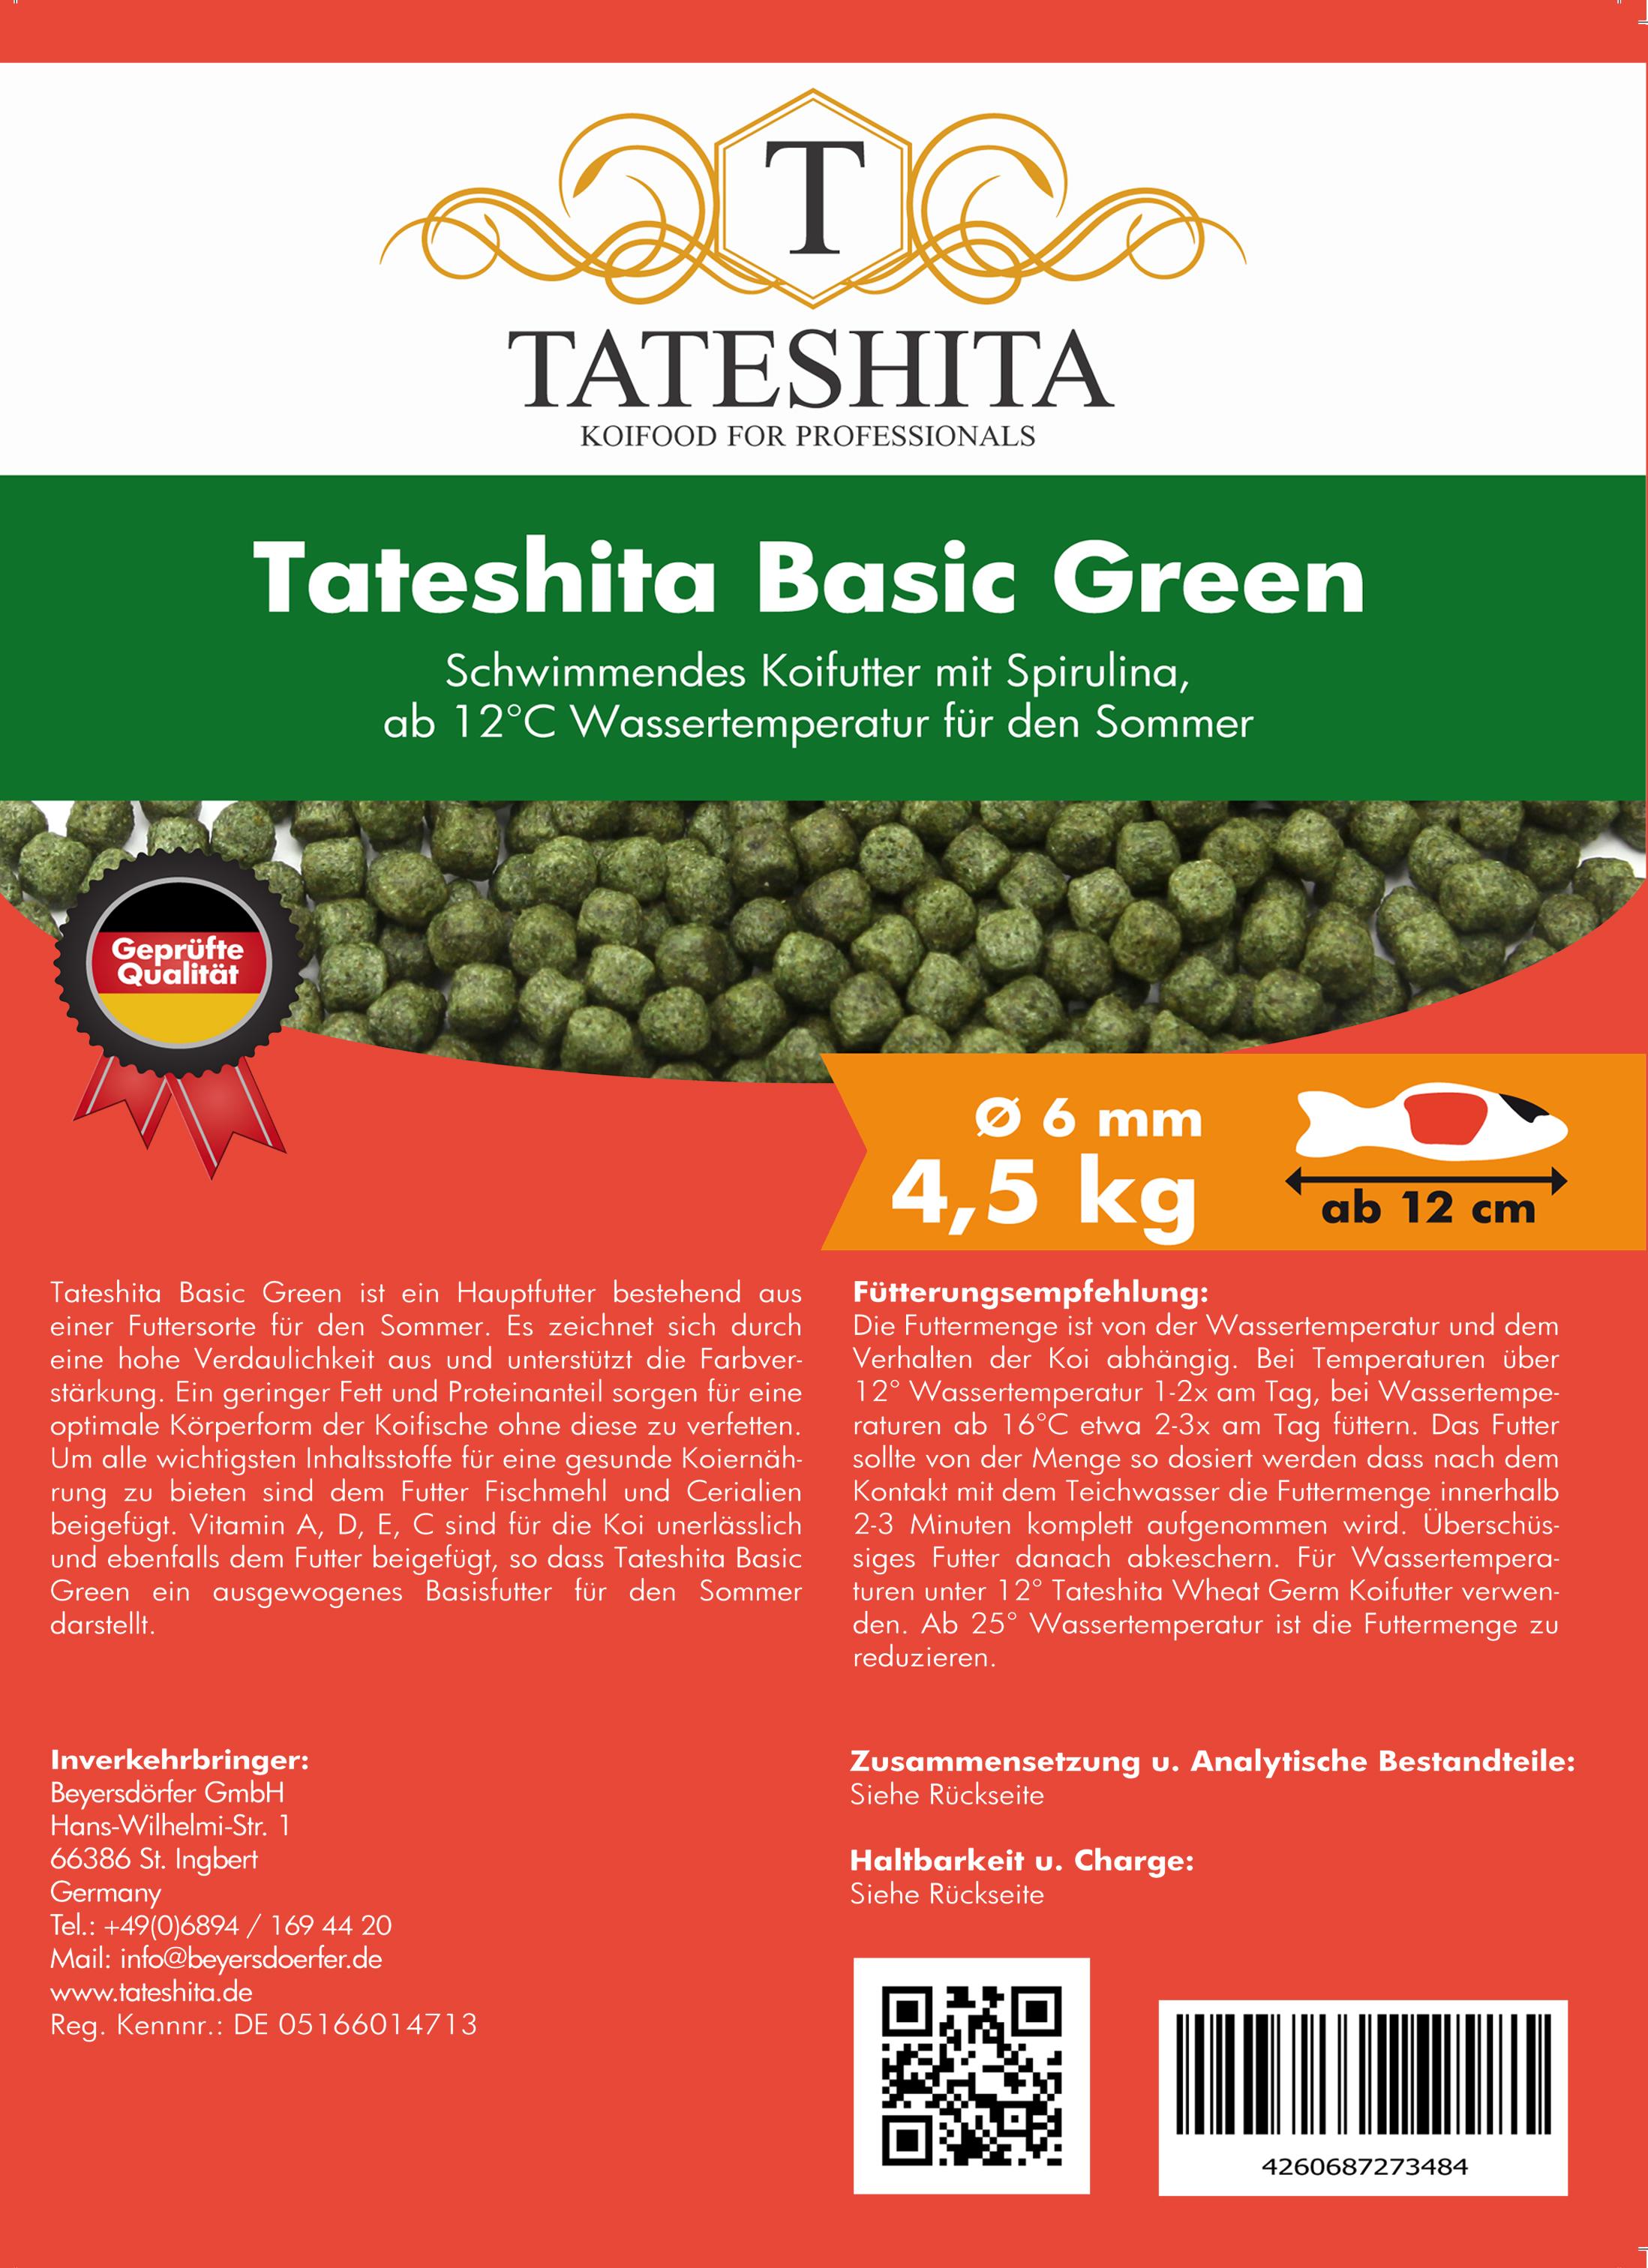 Tateshita Basic Green 4,5 Kg 6 mm